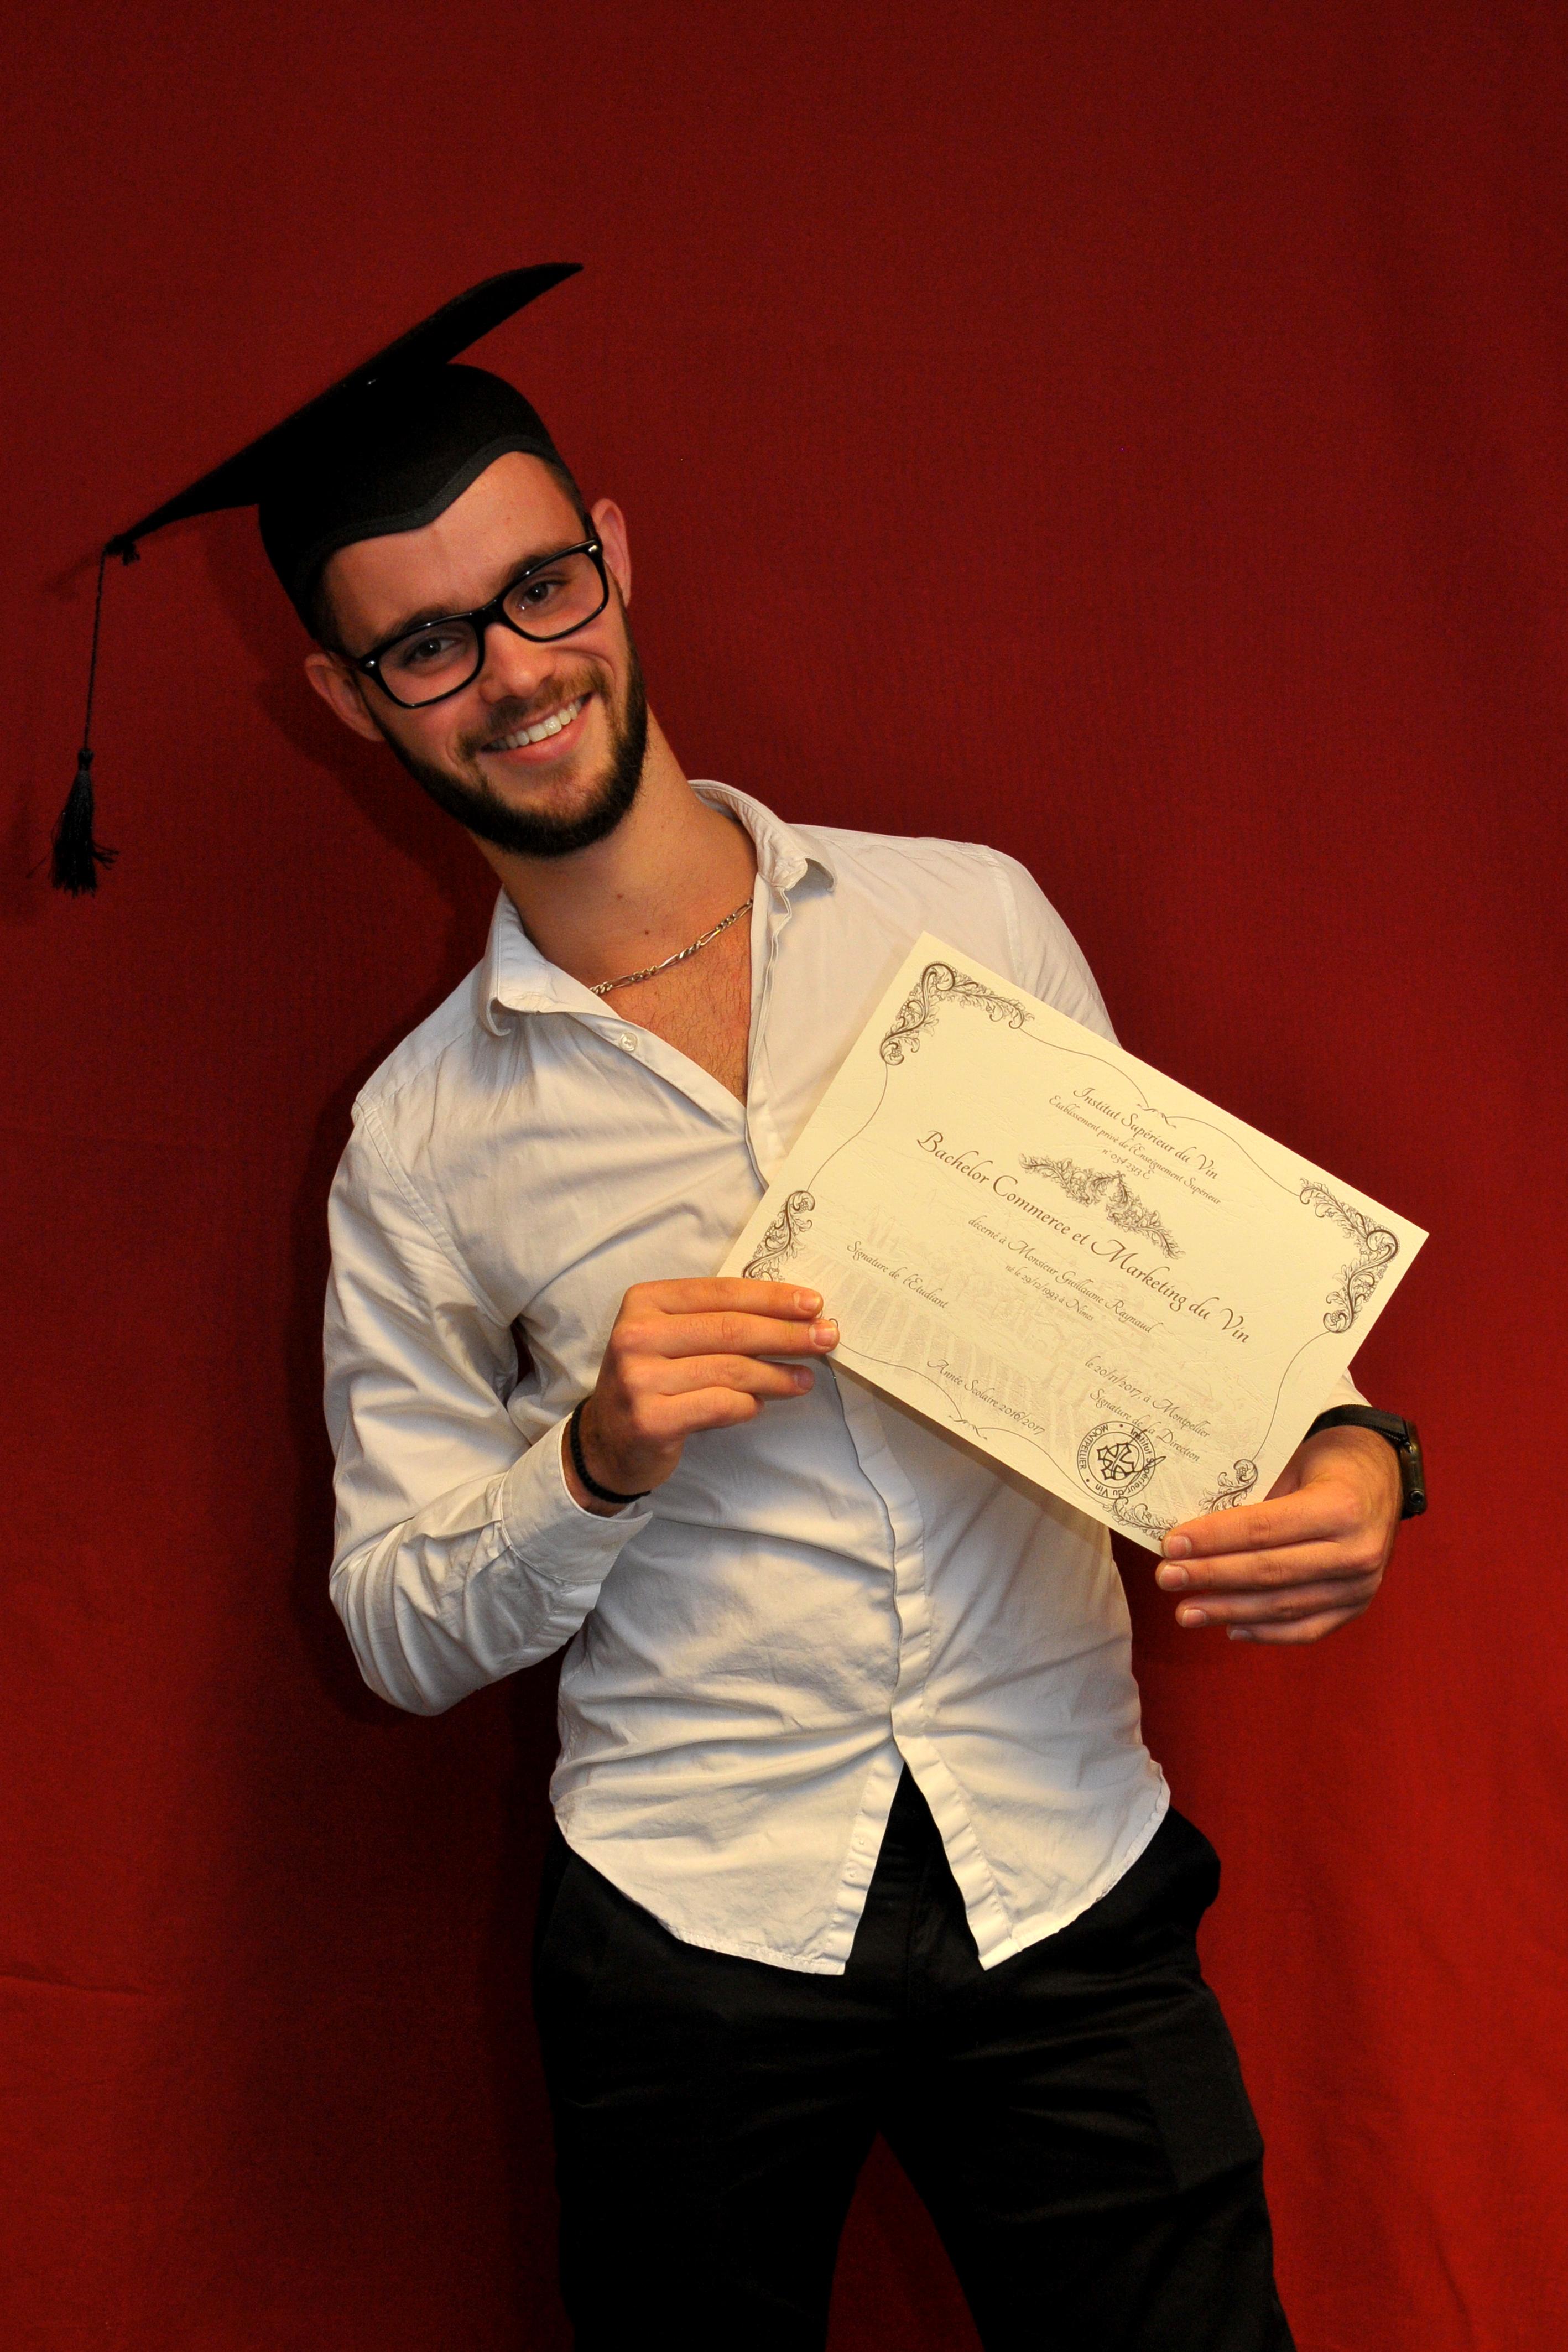 Remise des diplomes077